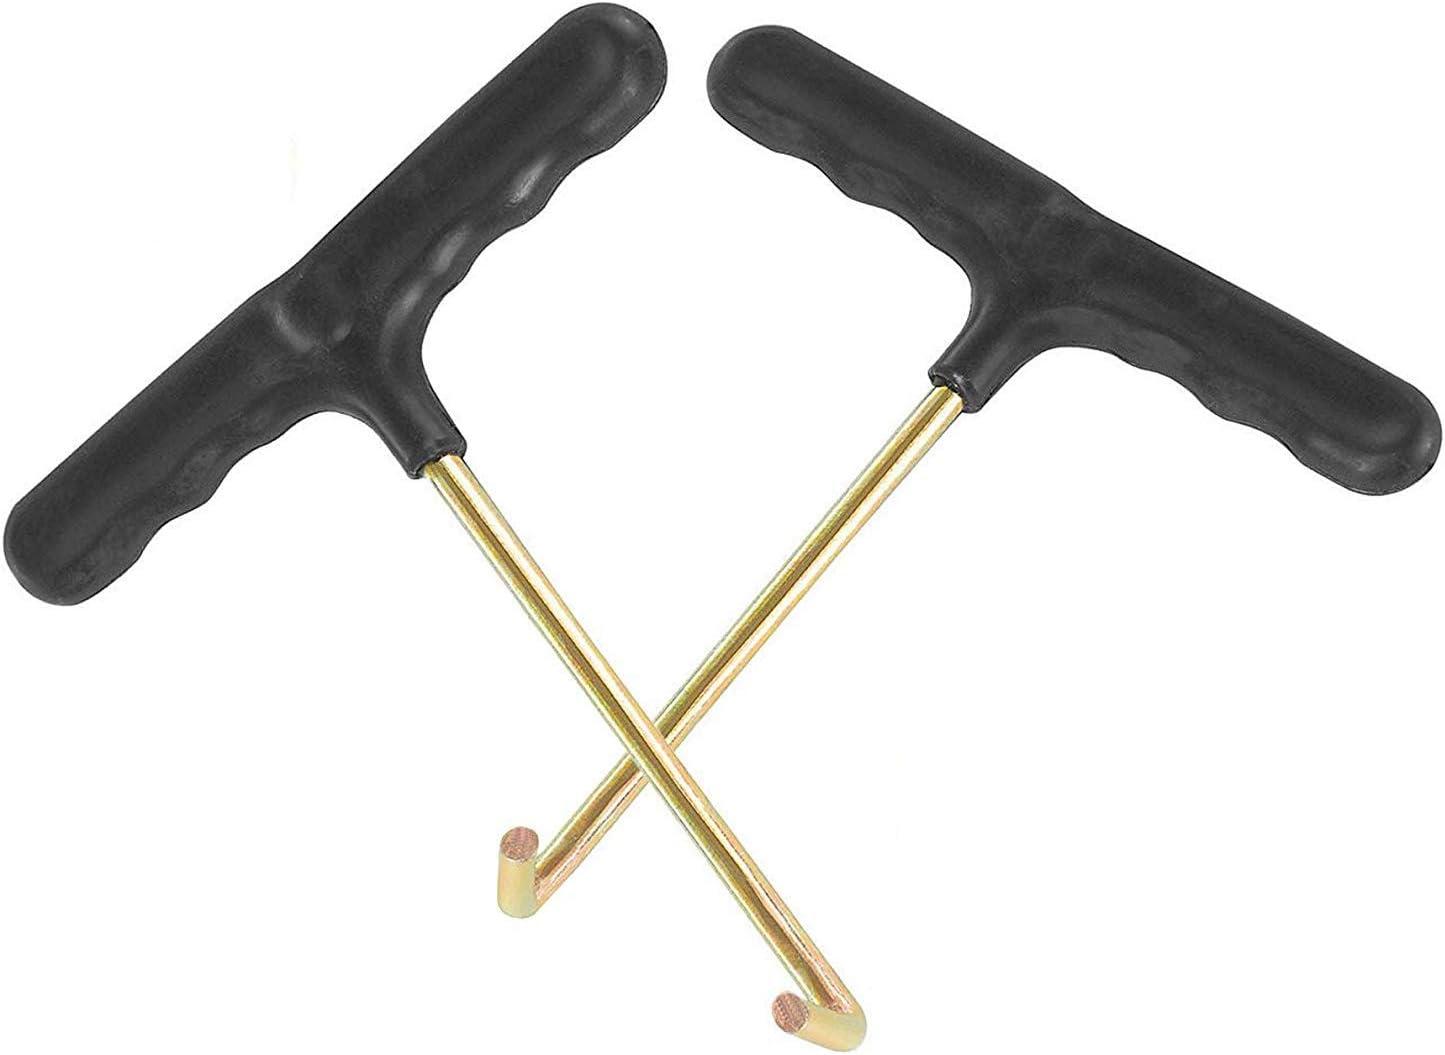 Meteou Trampoline Spring Pull Tool Kit 2 PackSpring T-Hook Adjustment Pull To